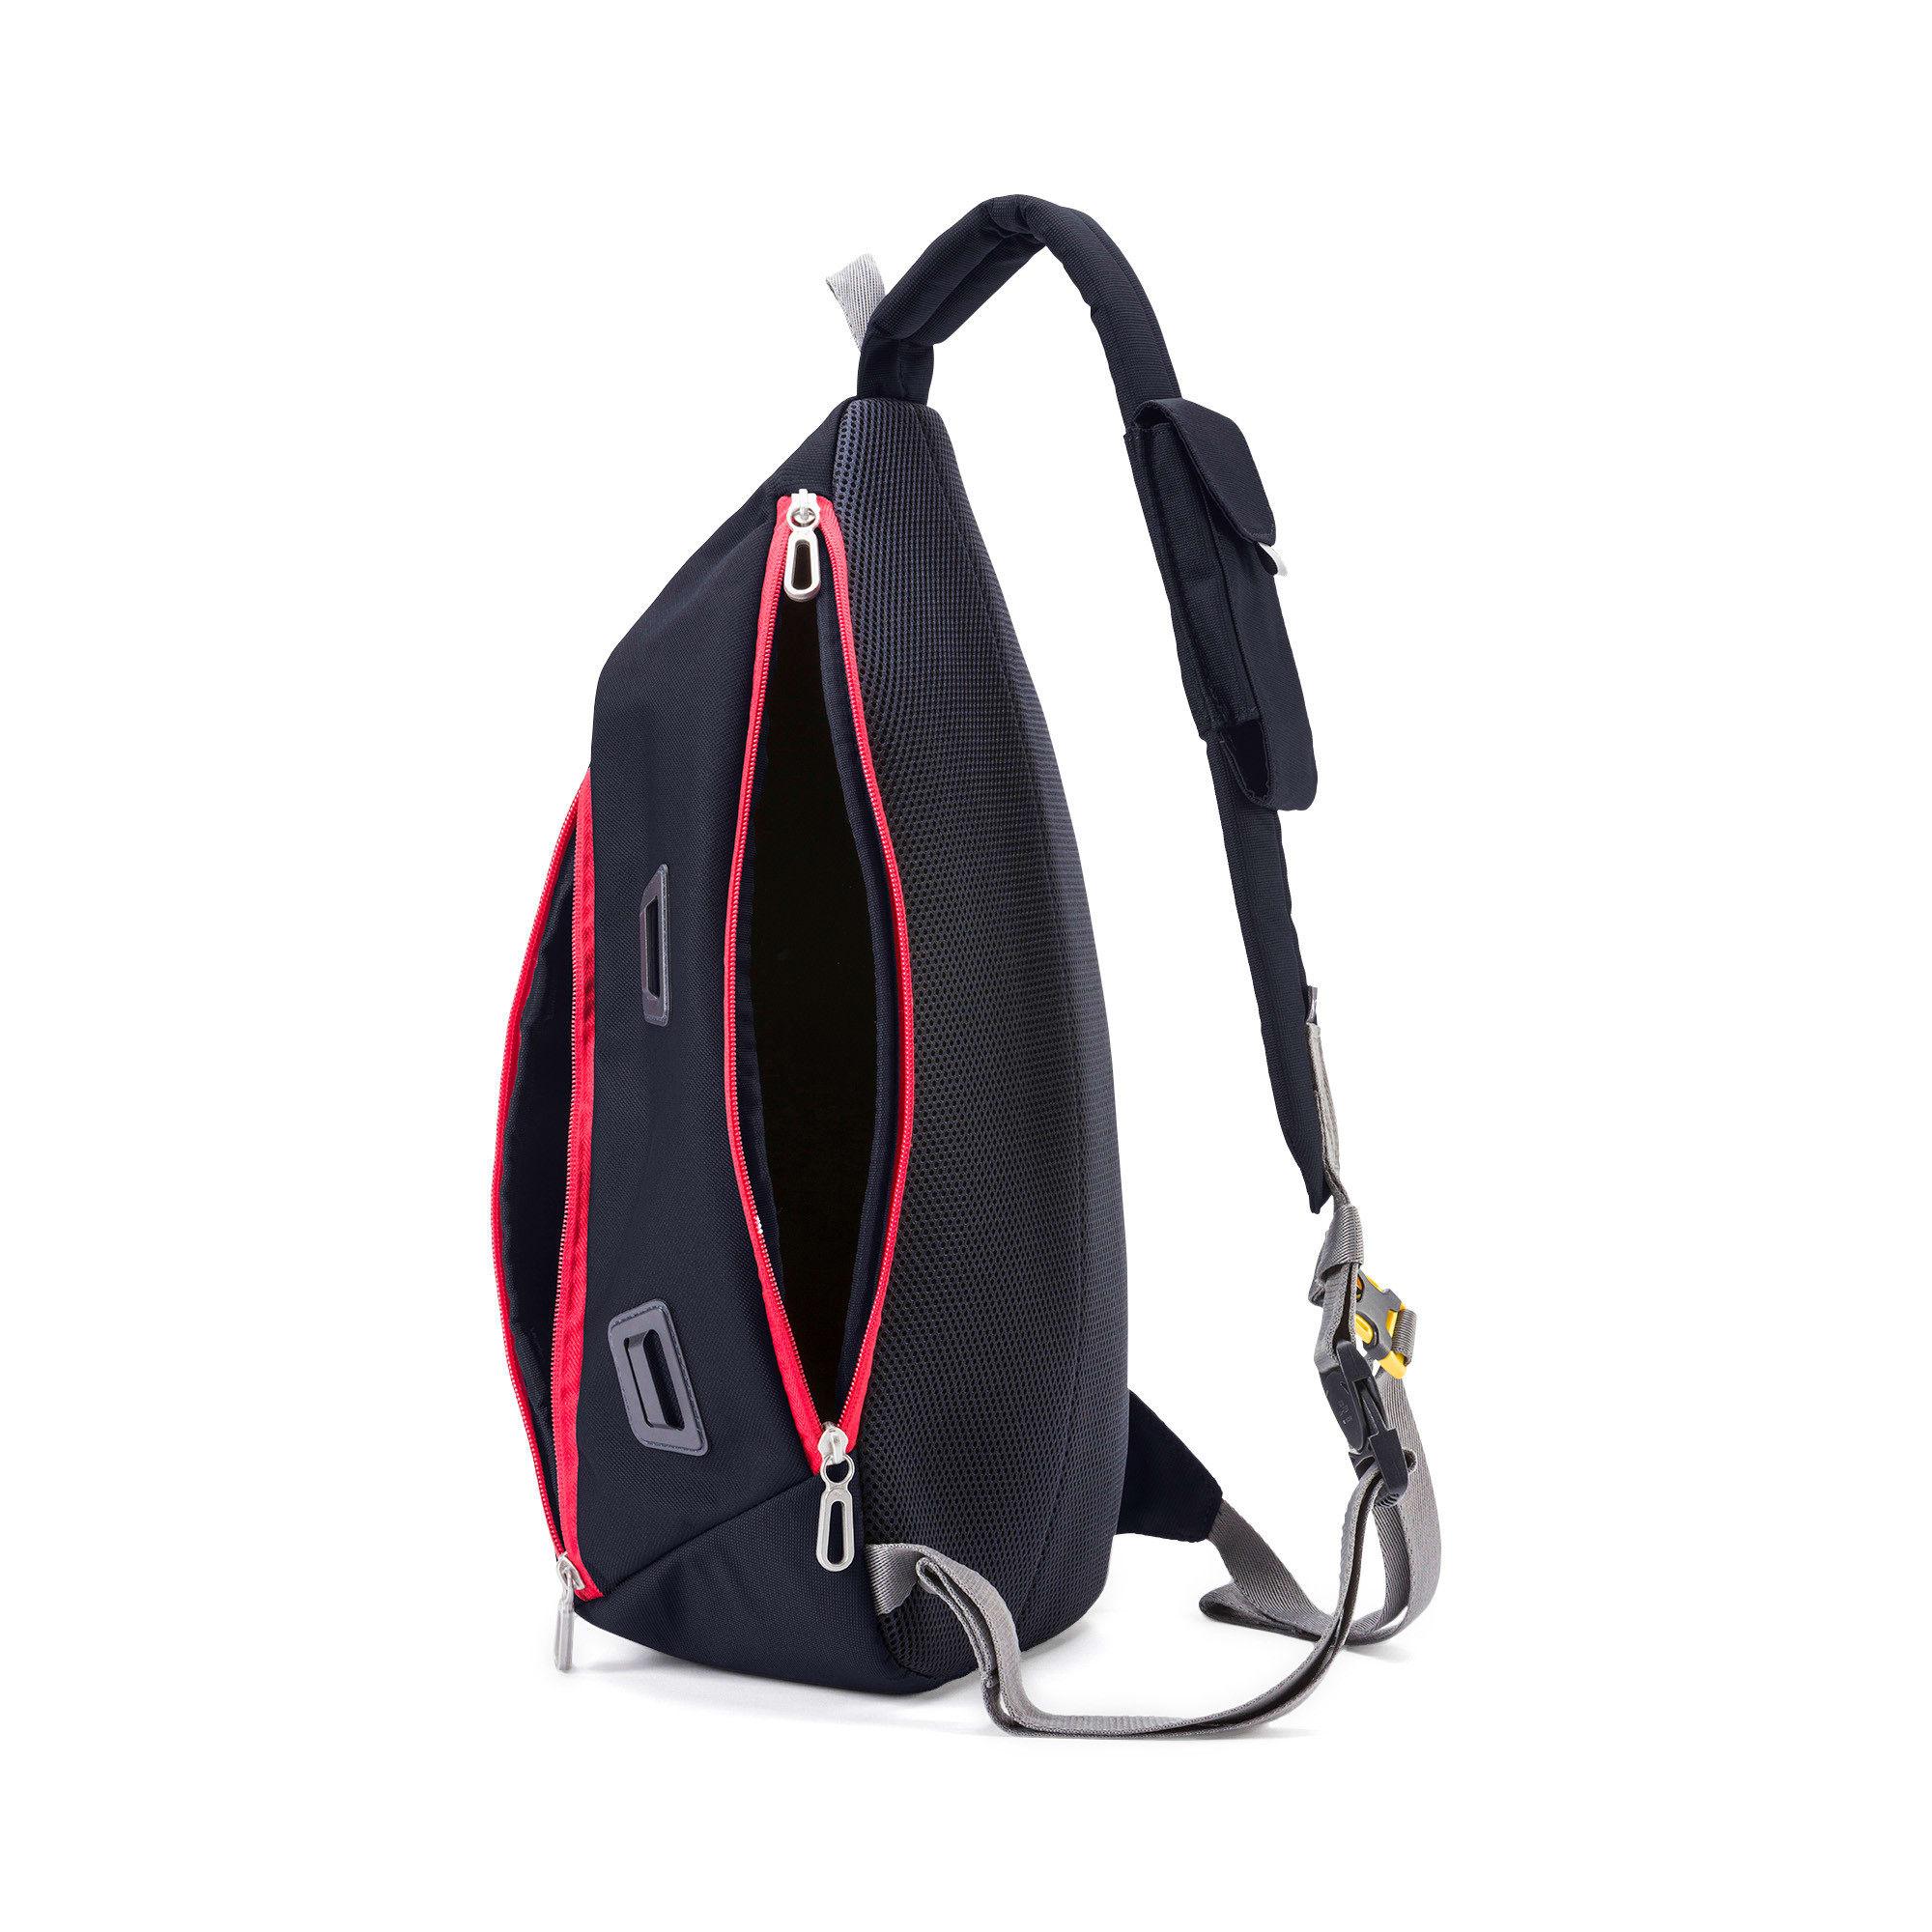 Thumbnail 3 of PUMA x RBR Lifestyle Sling Shoulder Bag, NIGHT SKY, medium